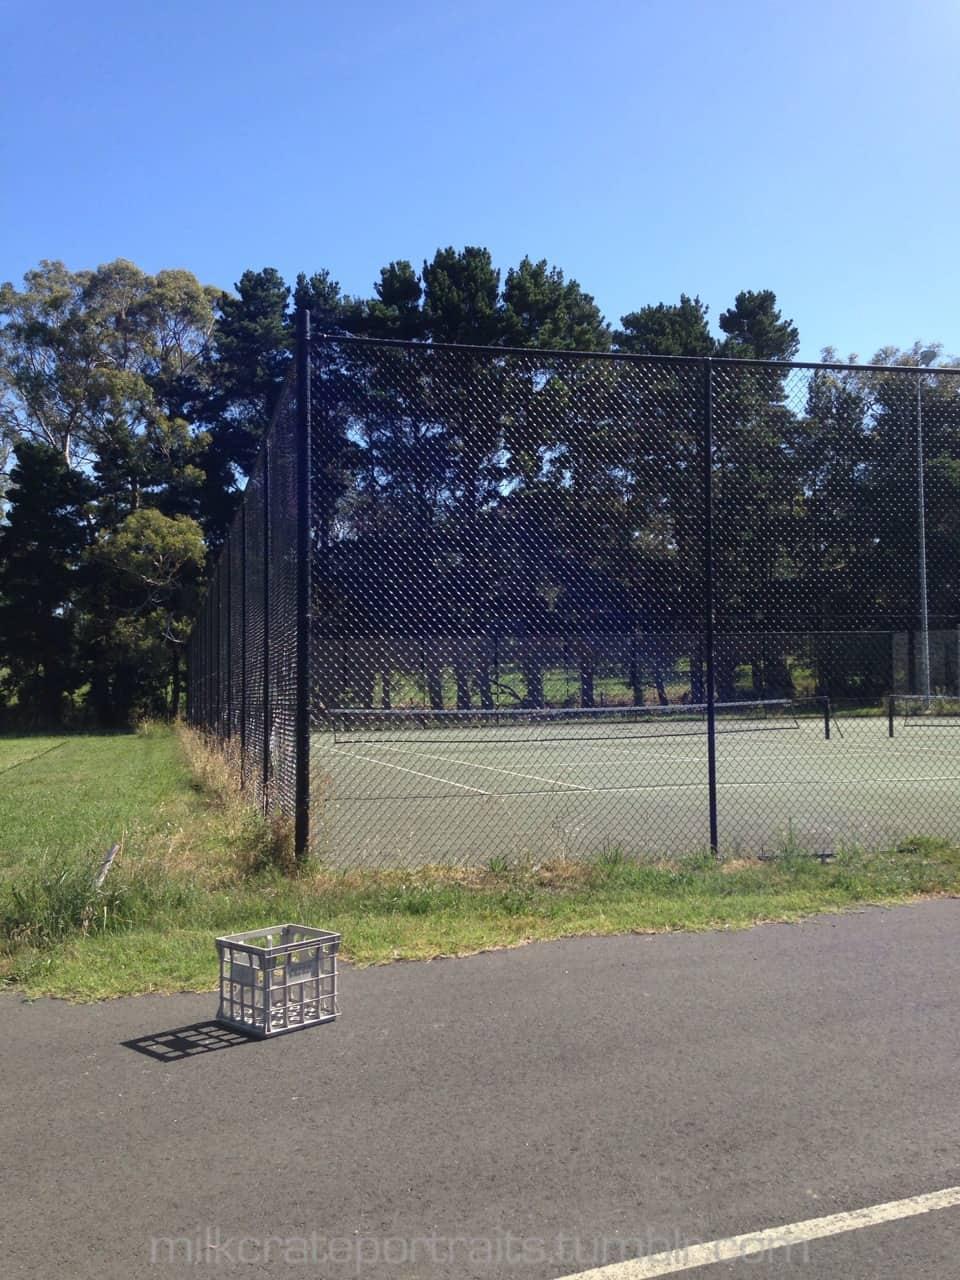 Tennis crate